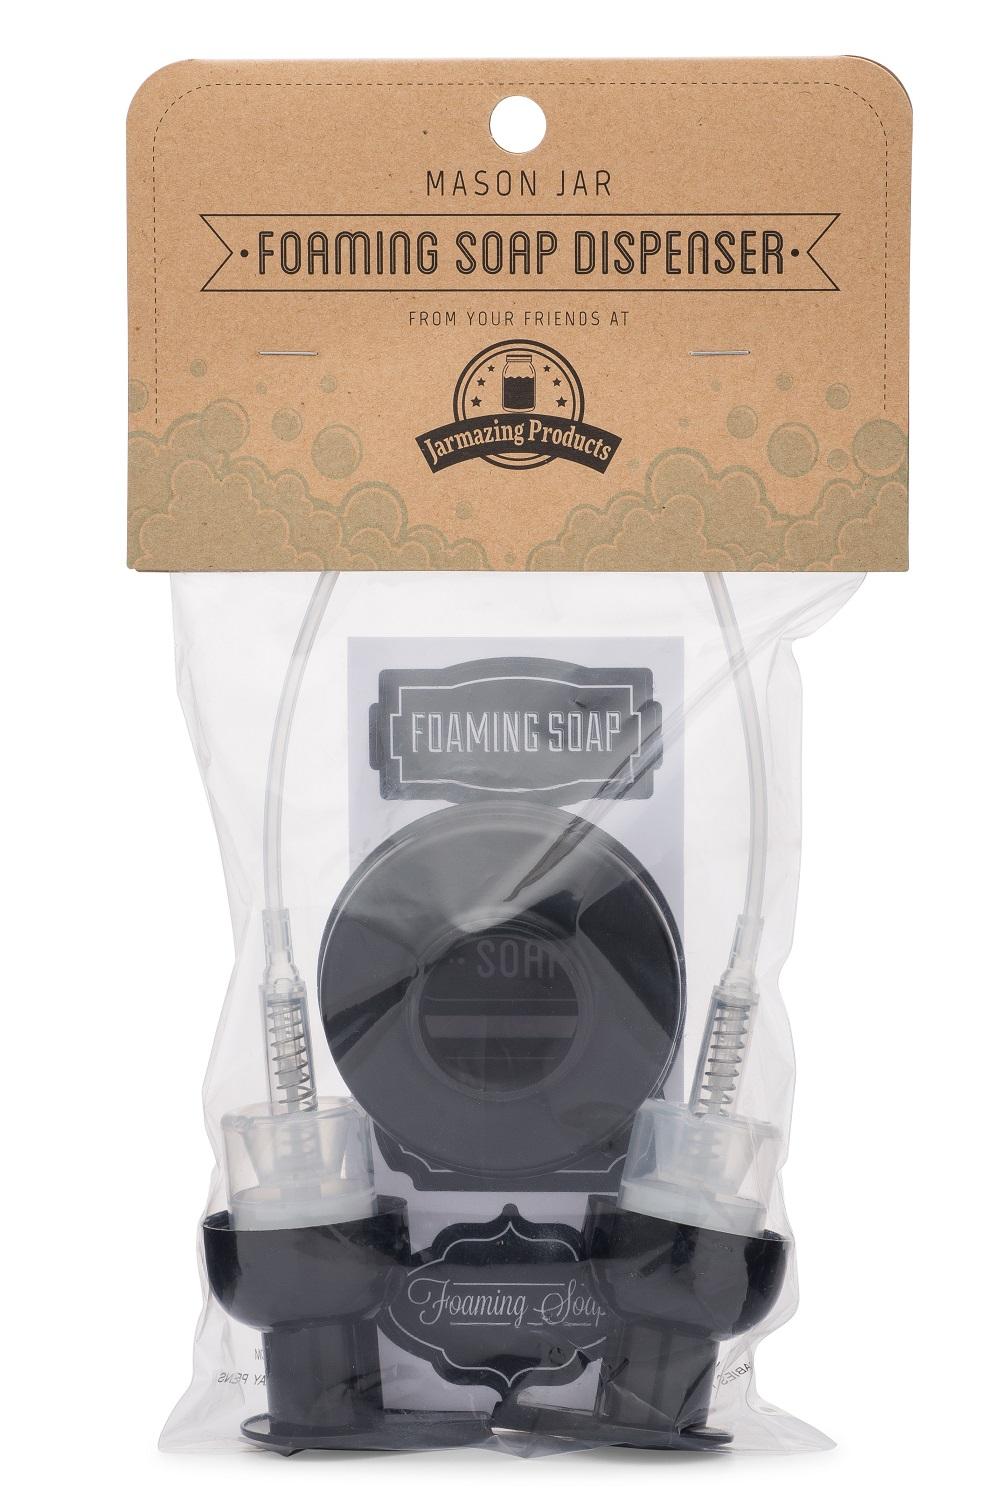 Mason Jar Foaming Soap Dispenser Lids   Black   2 Pack   Mj Foaming  ...